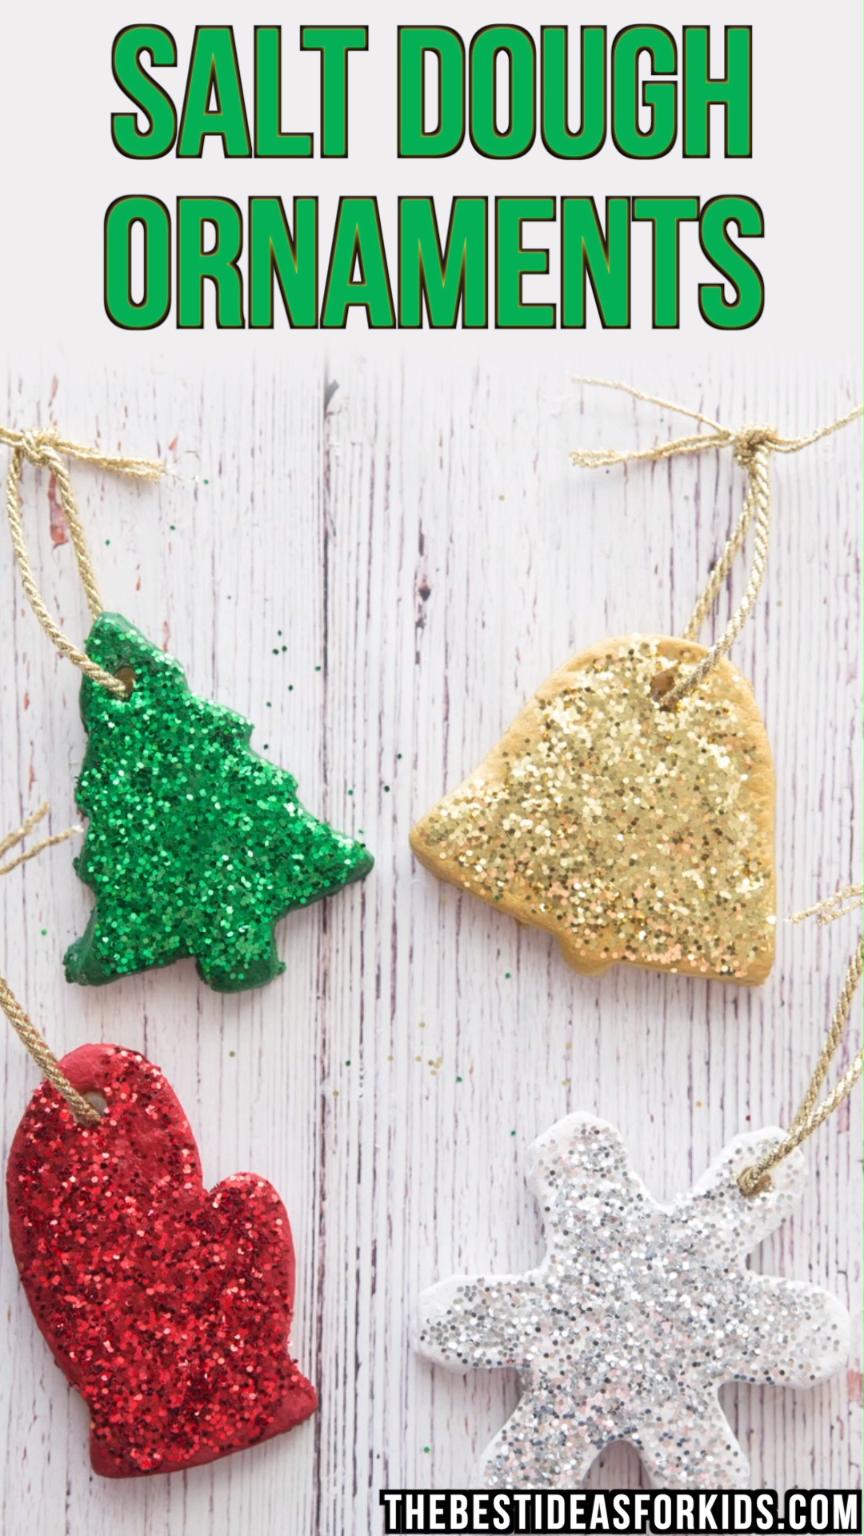 Salt Dough Ornament Recipe #diychristmasgifts